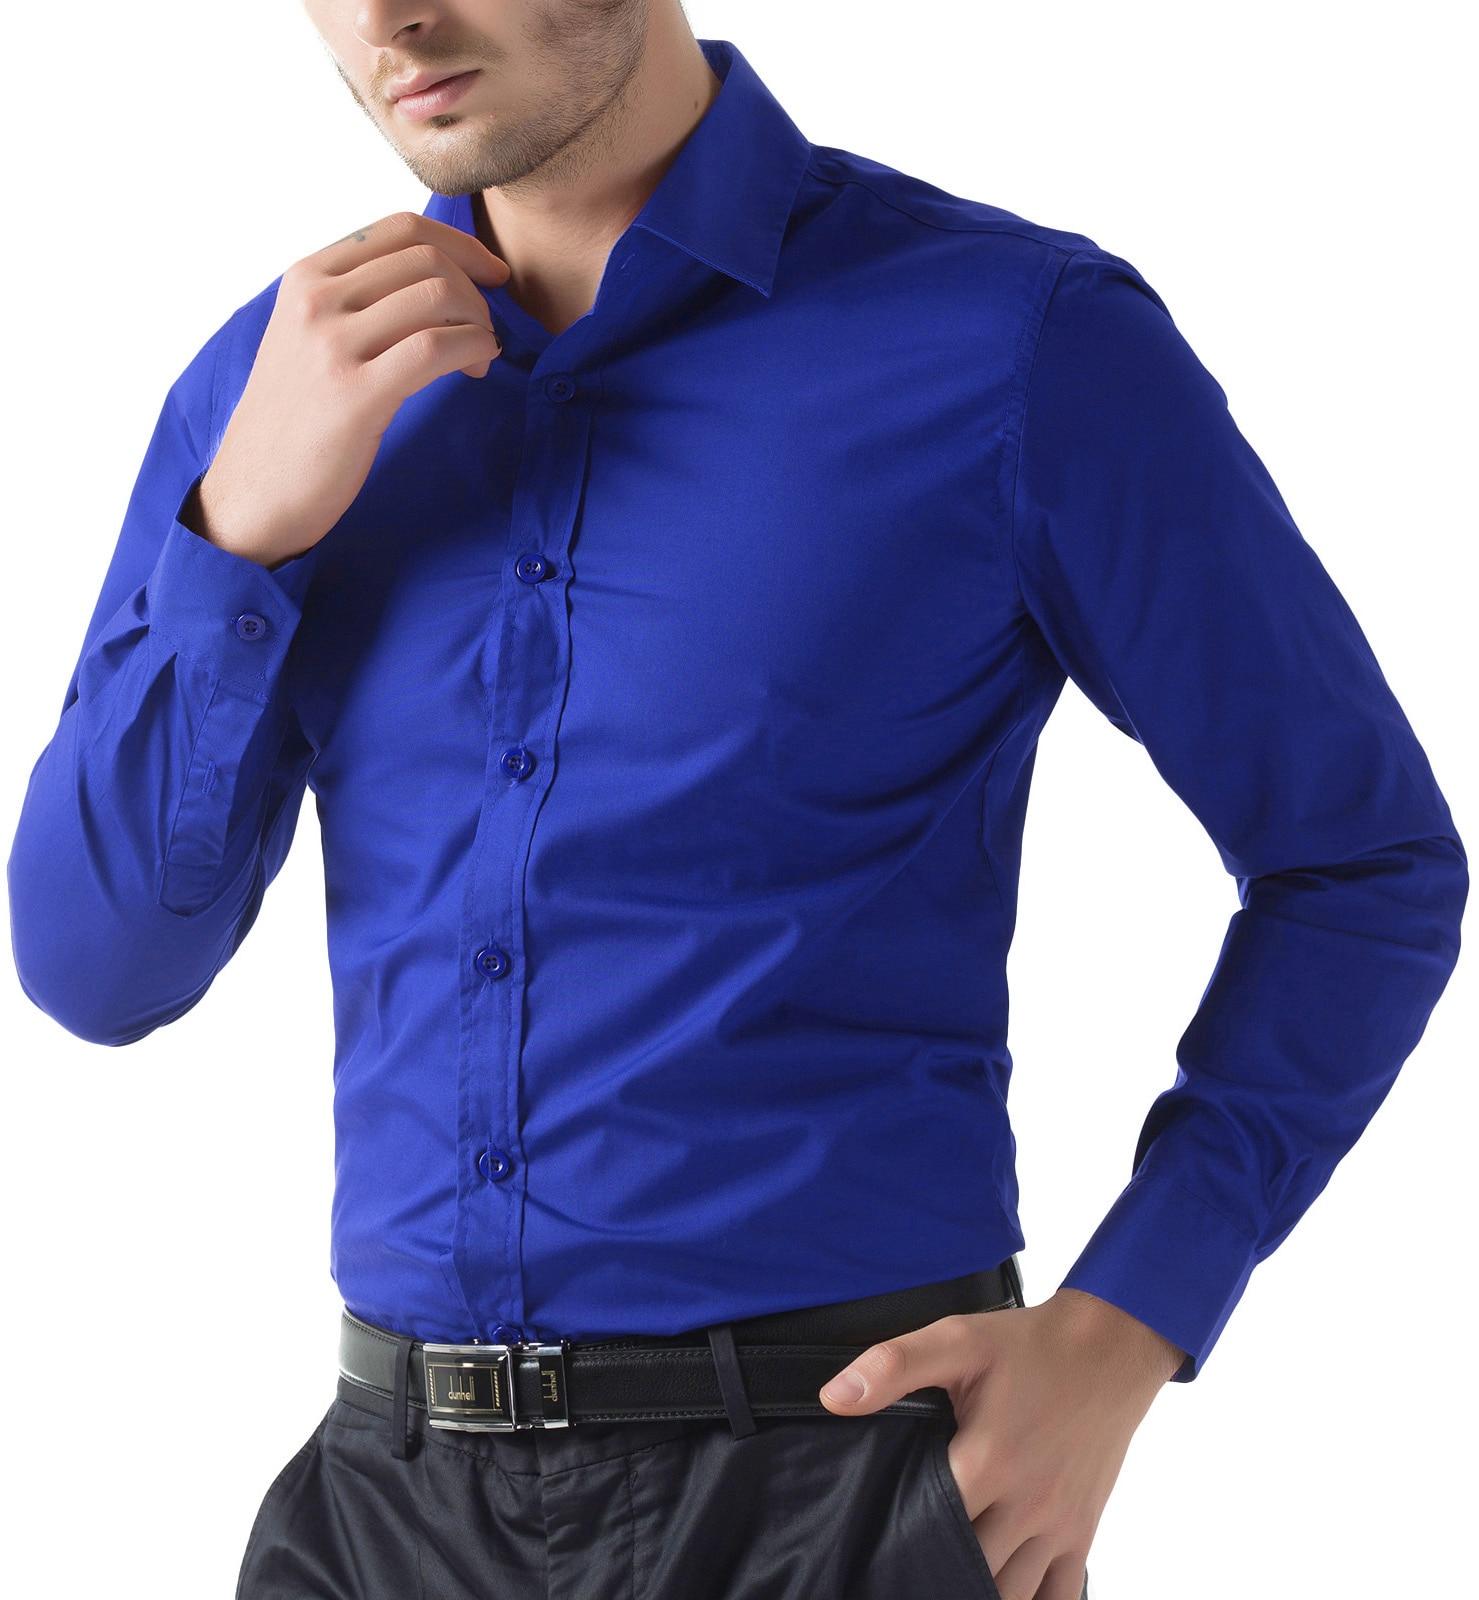 Fashion Mens Luxury Long Sleeve Shirt Casual Slim Fit Stylish Tops Trendy Cool